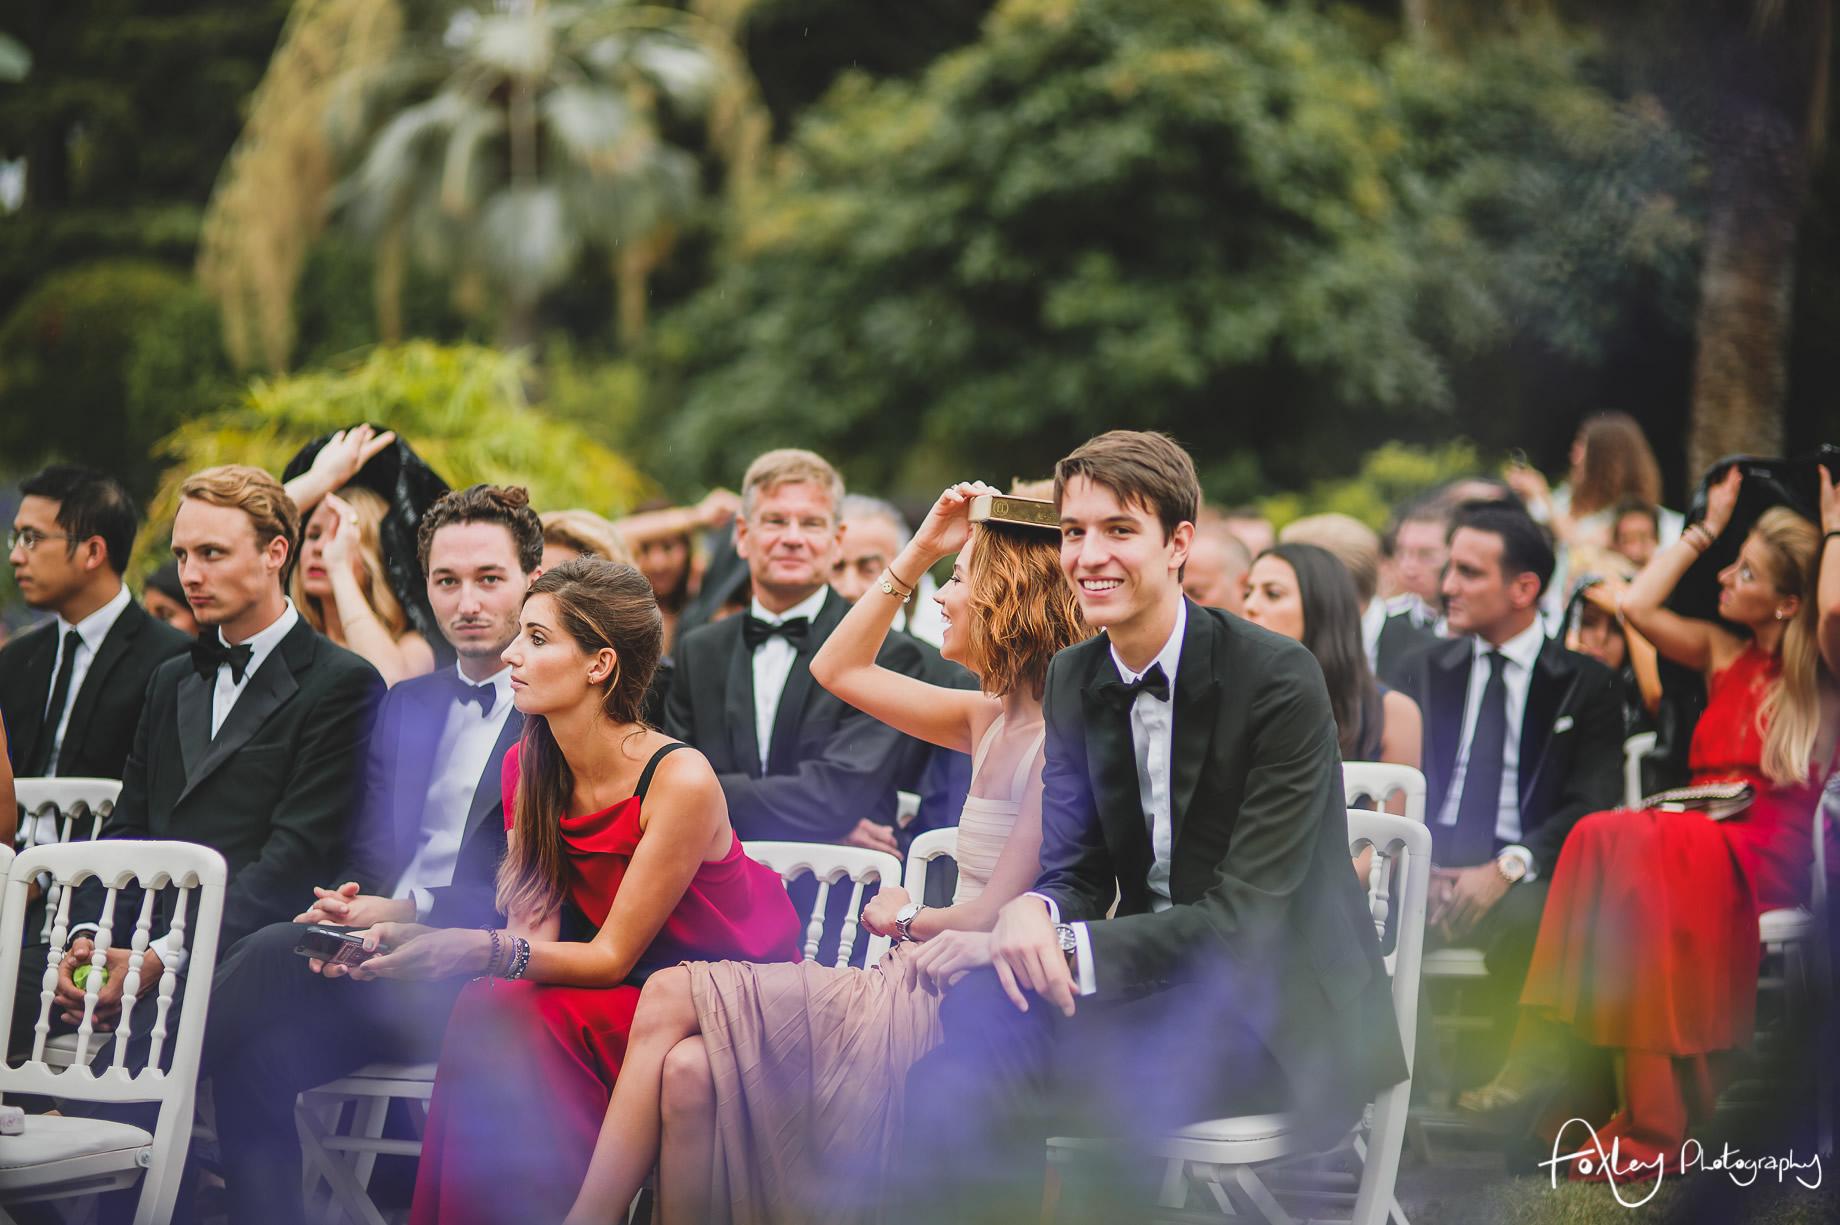 Jil and Will's Wedding at Villa Ephrussi De Rothschild 074